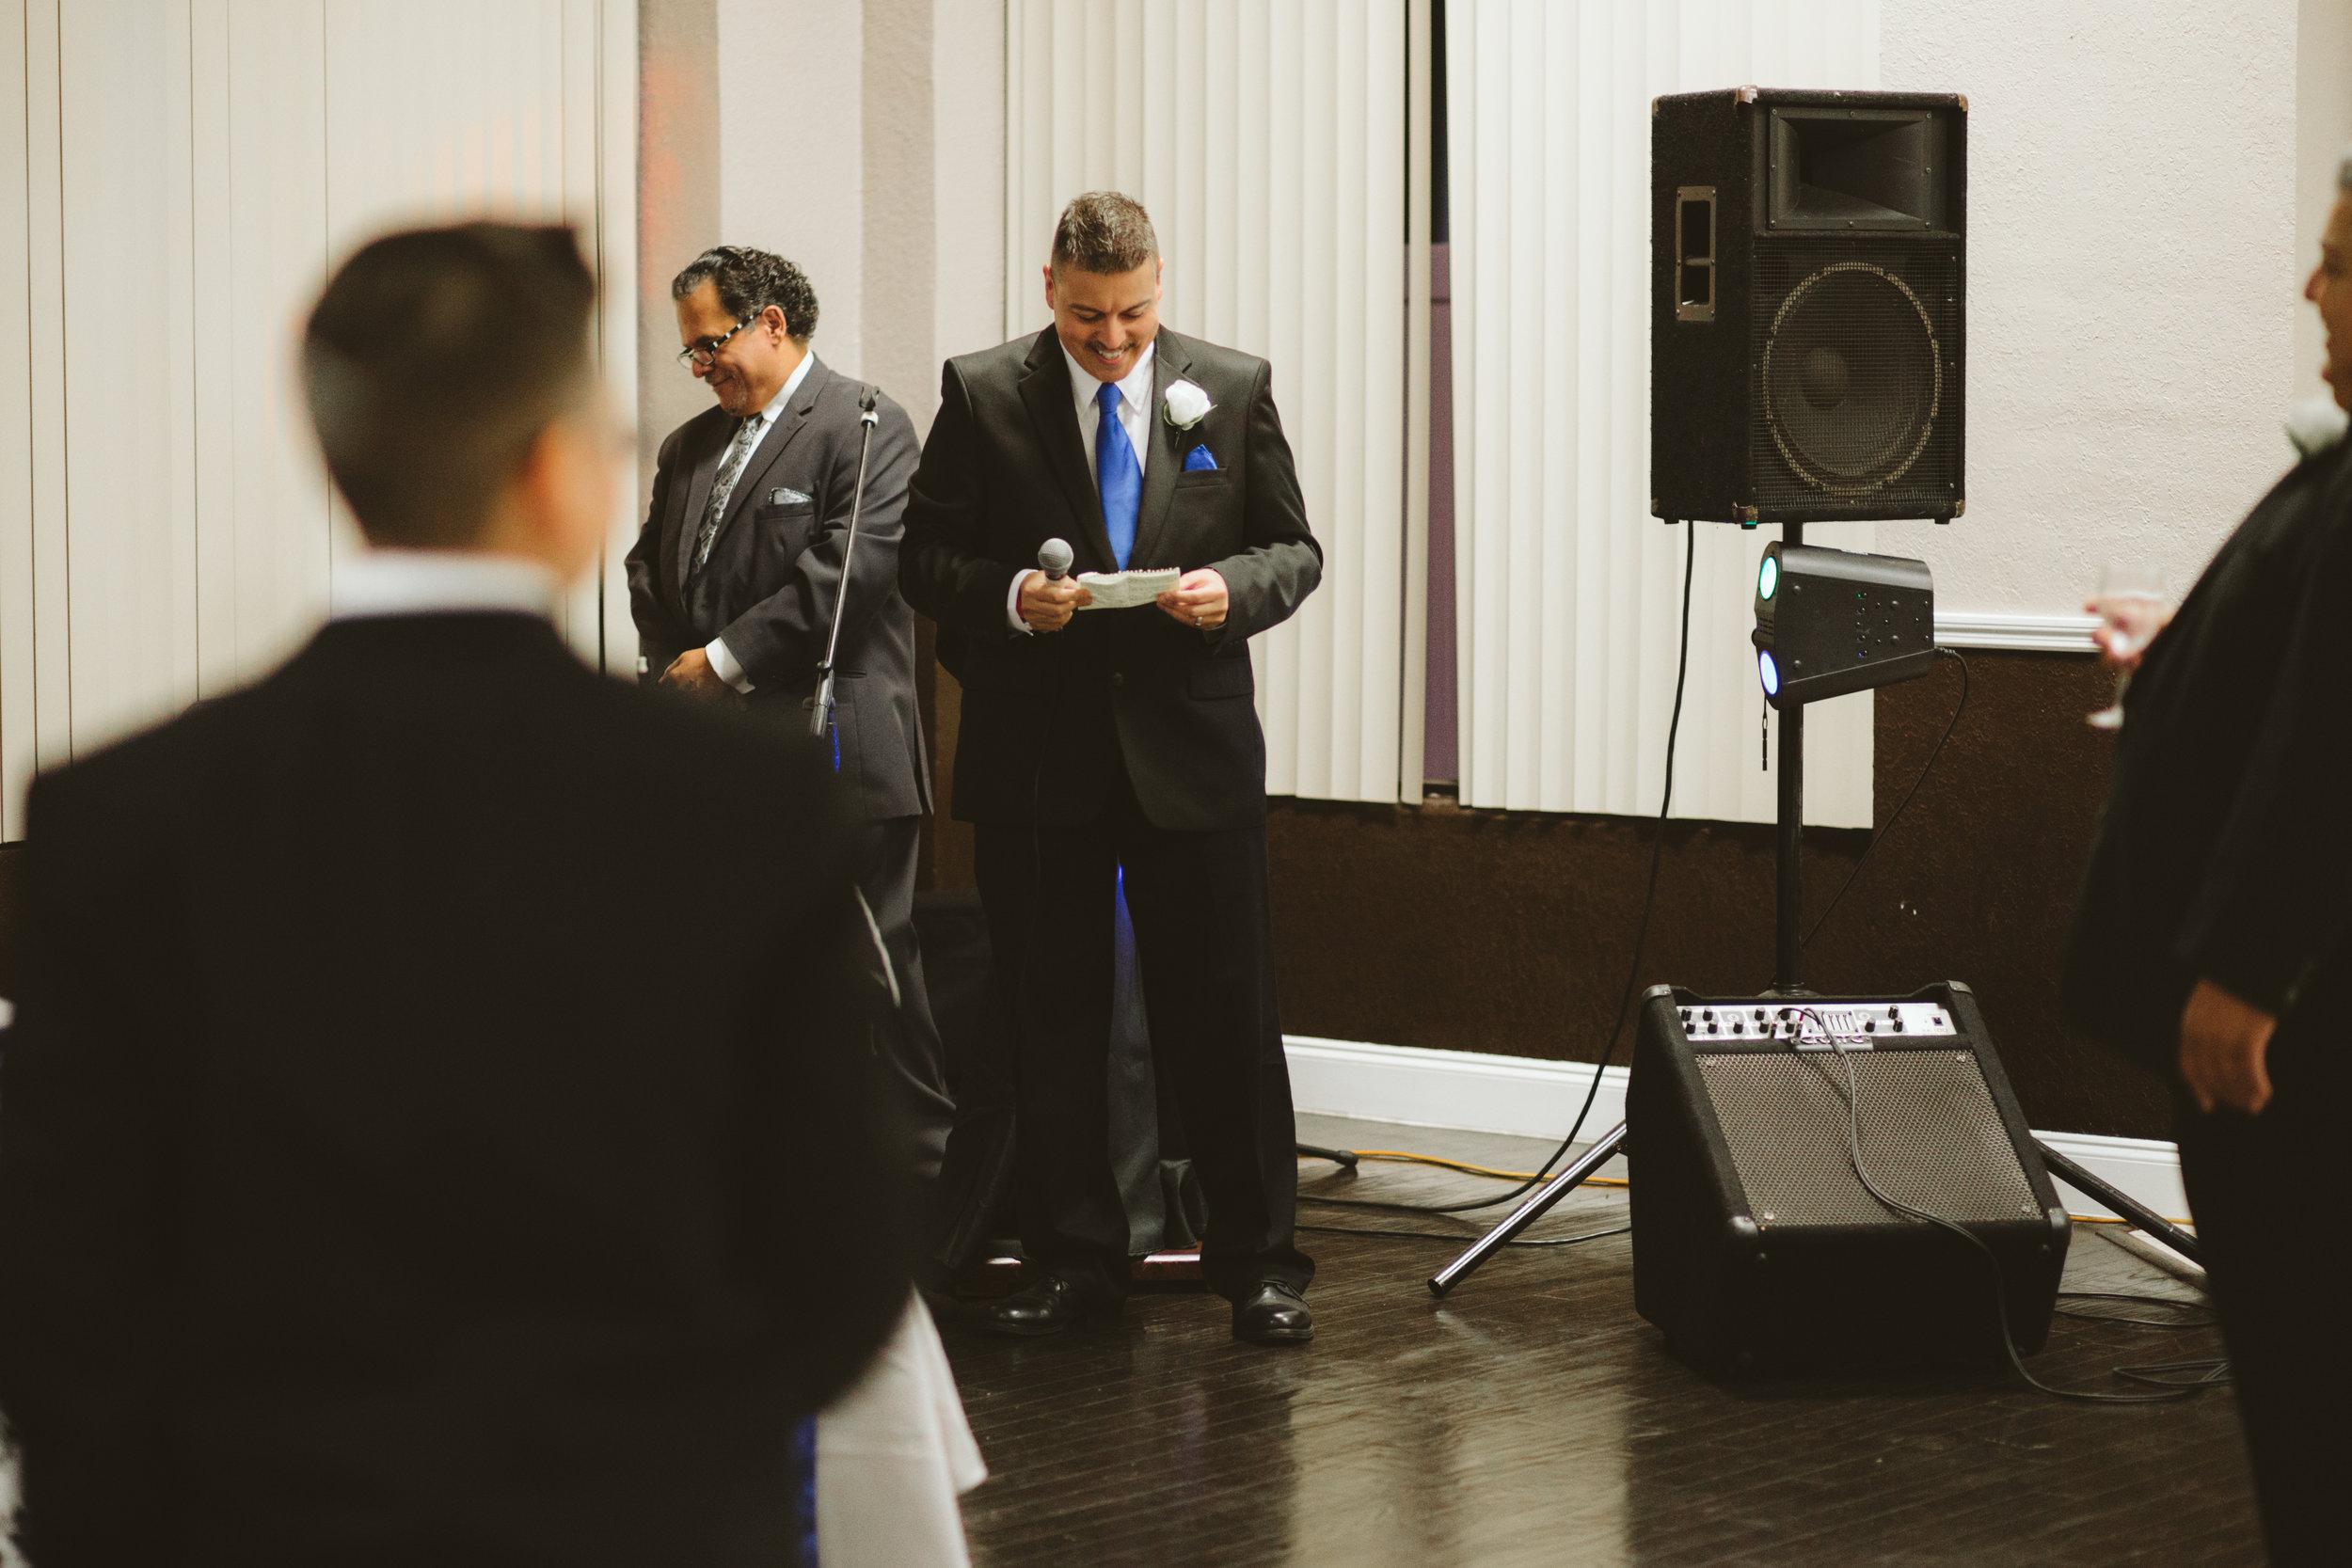 wedding | Vanessa Boy Photography | vanessaboy.com |-268.jpg